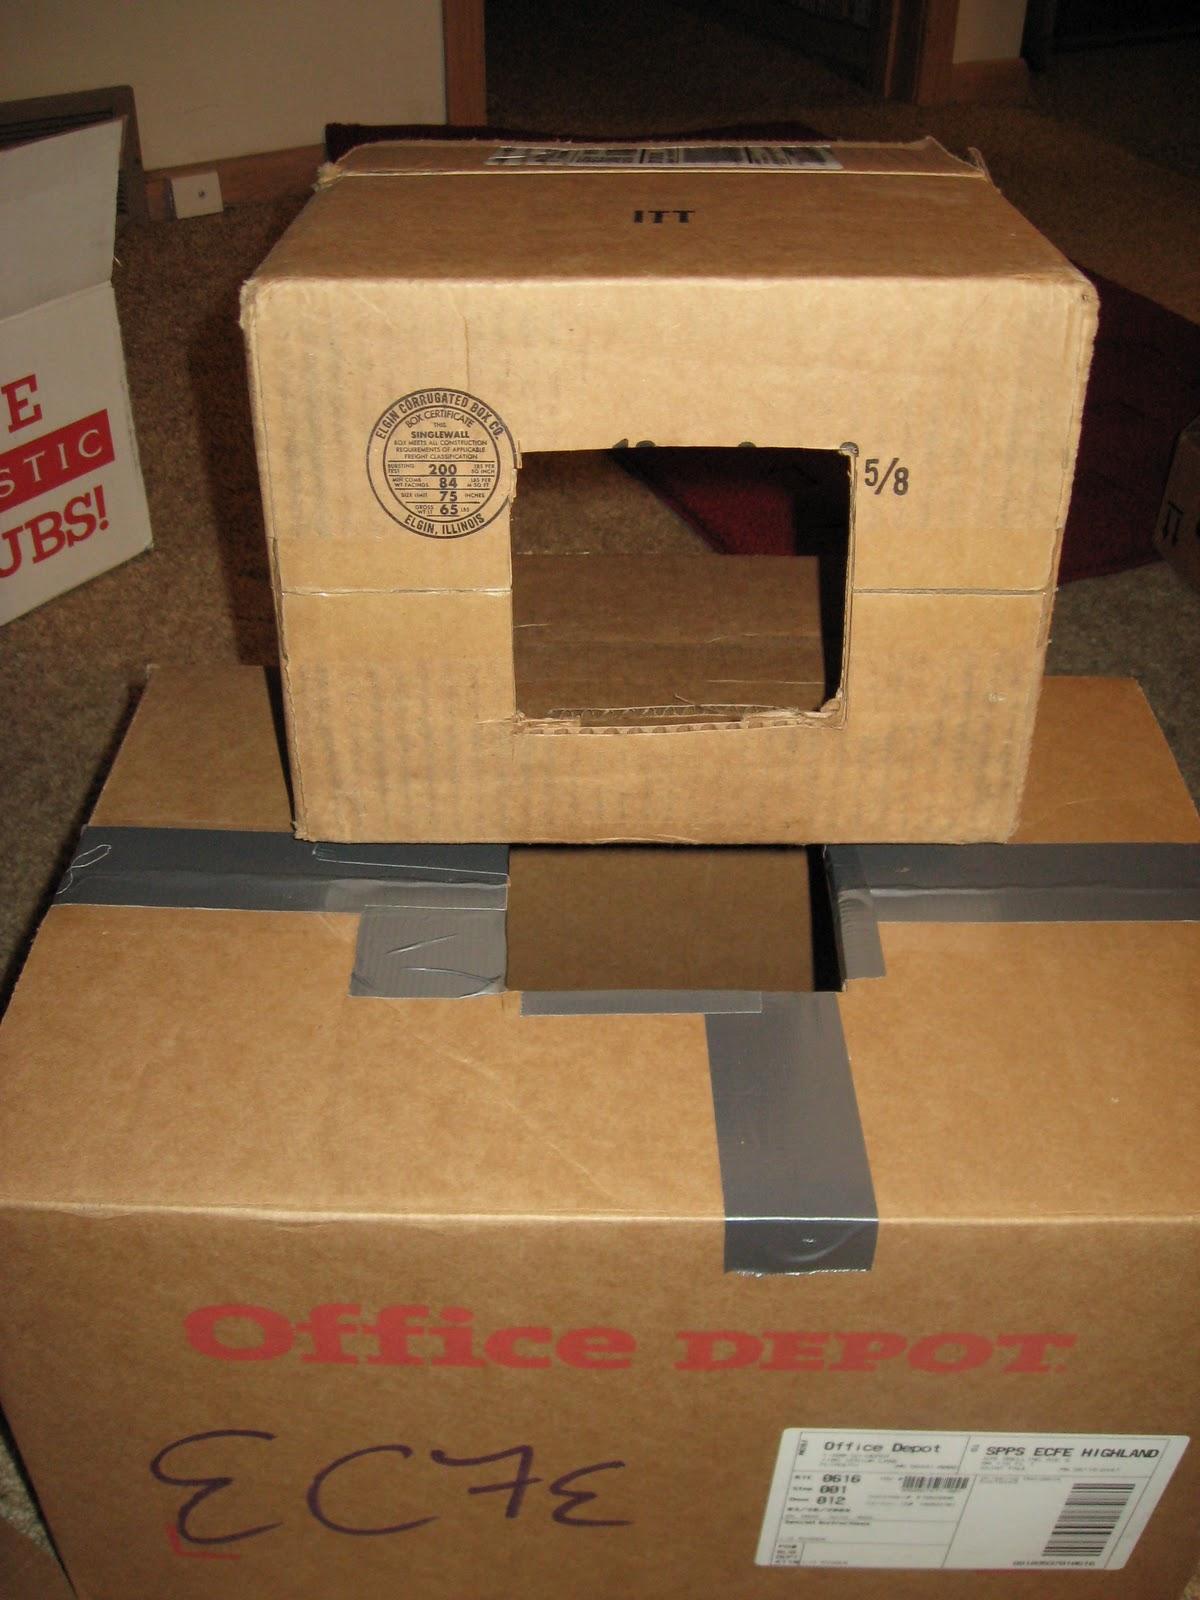 hole in a the box dick Cut